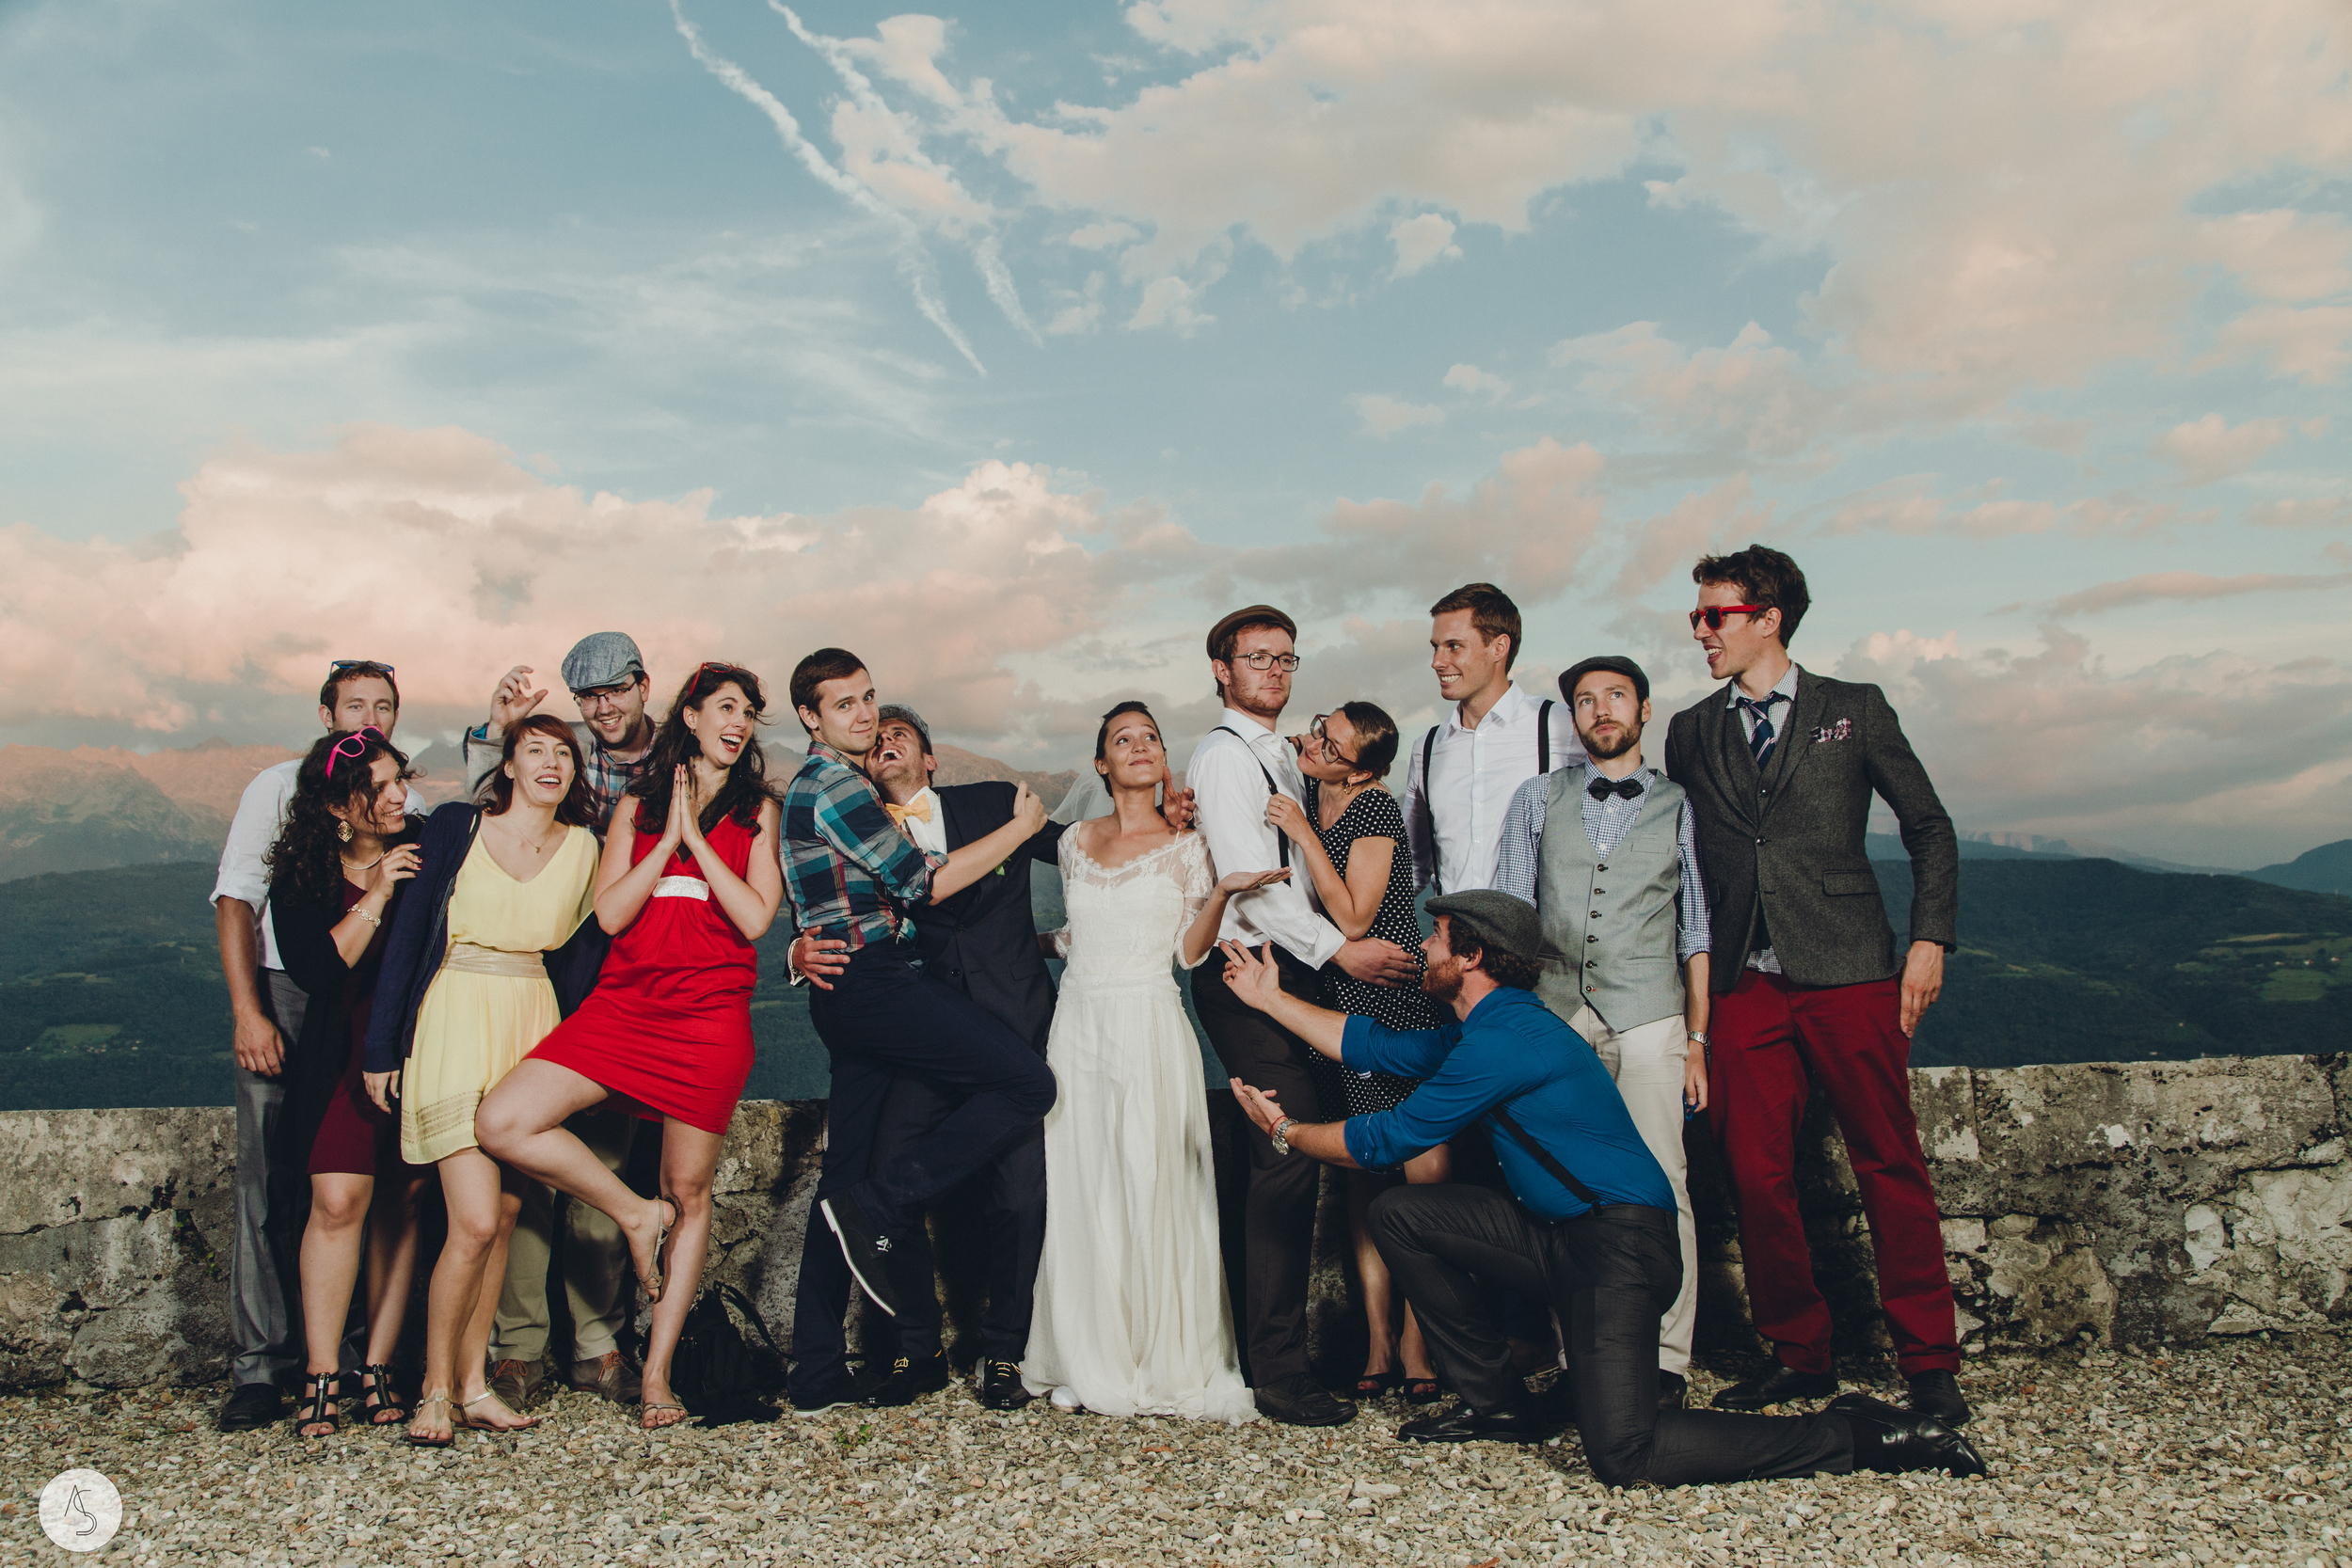 photographe mariage Grenoble-114.jpg